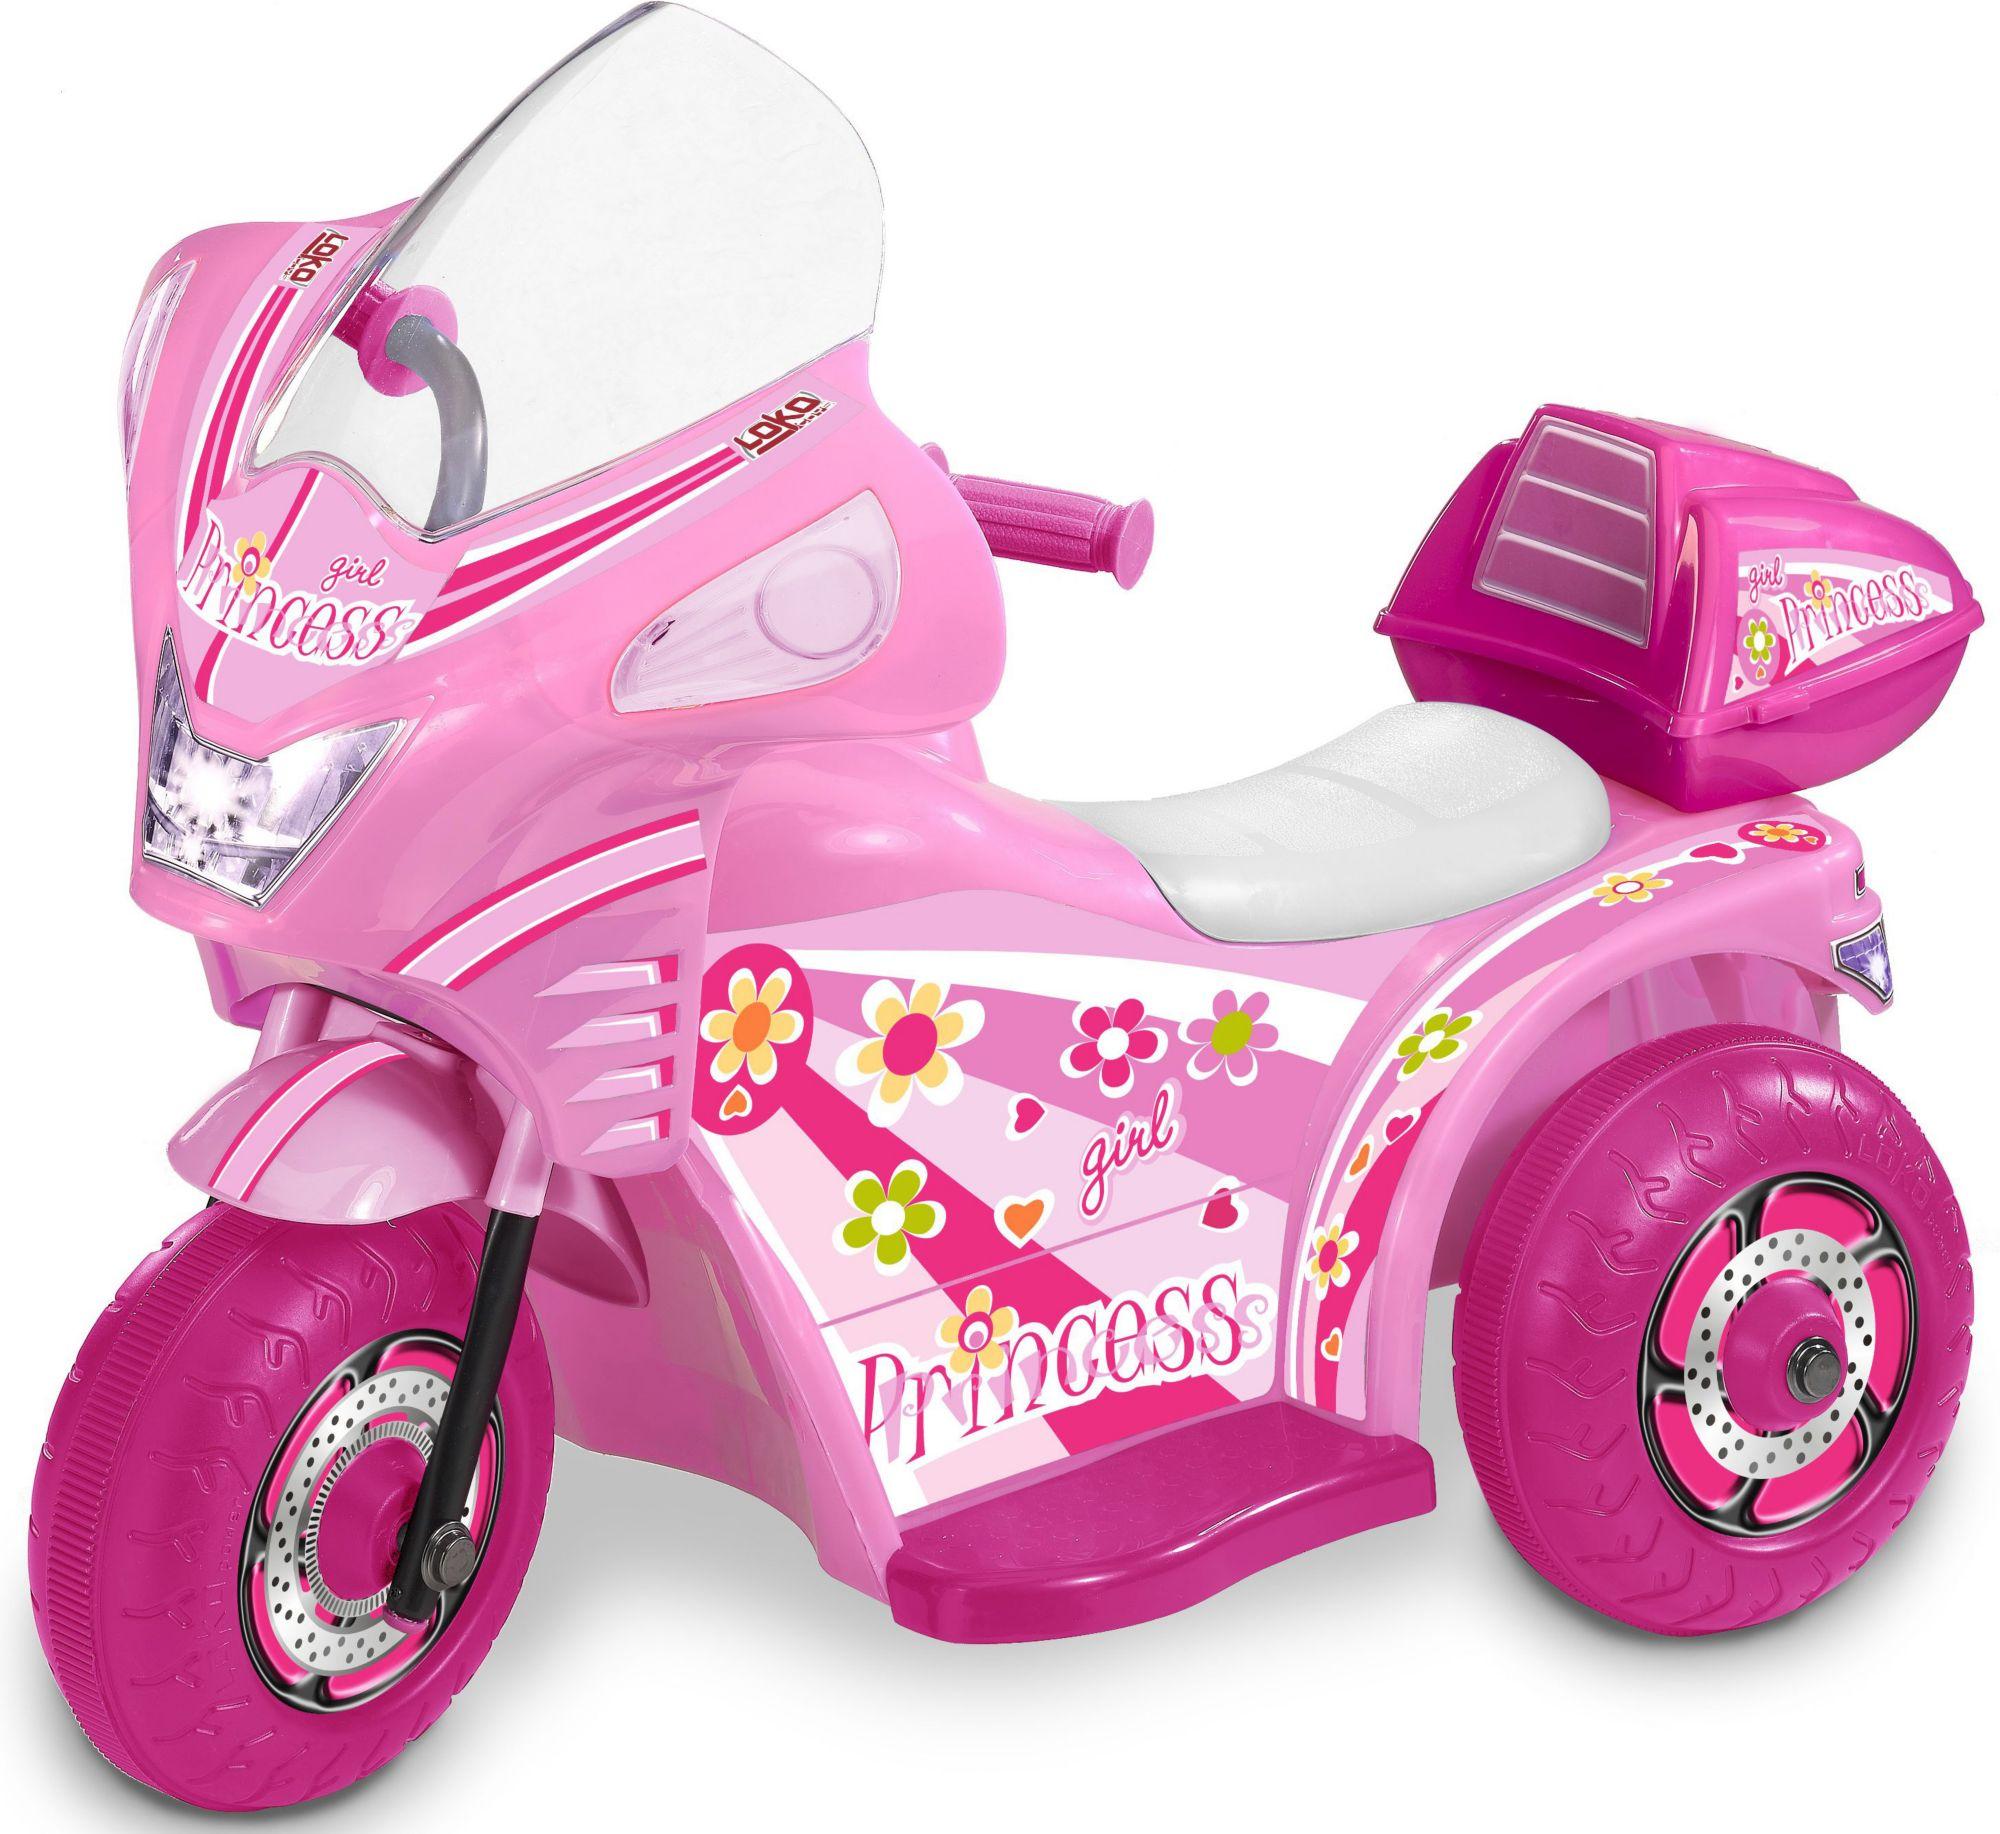 CARROMCO Carromco Elektrofahrzeug für Kinder, »Tribike, Princess«